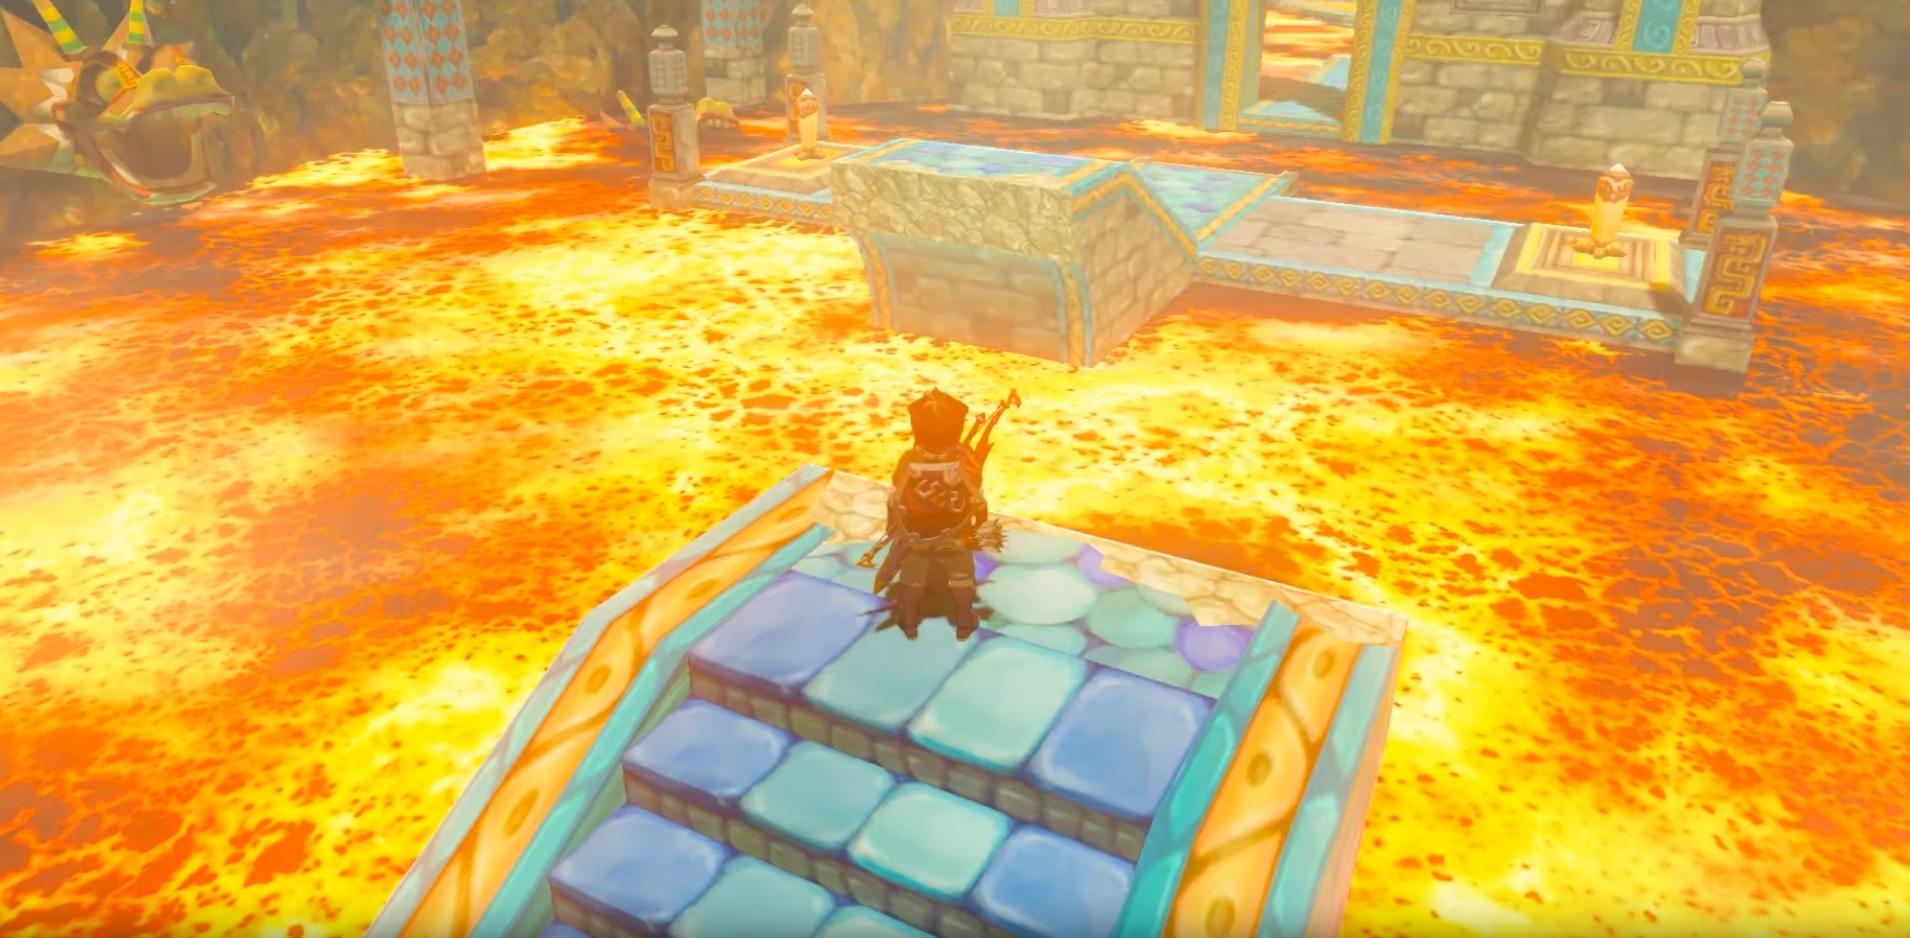 Zelda: Breath of the Wild has a playable Skyward Sword Earth Temple thanks to a modder screenshot